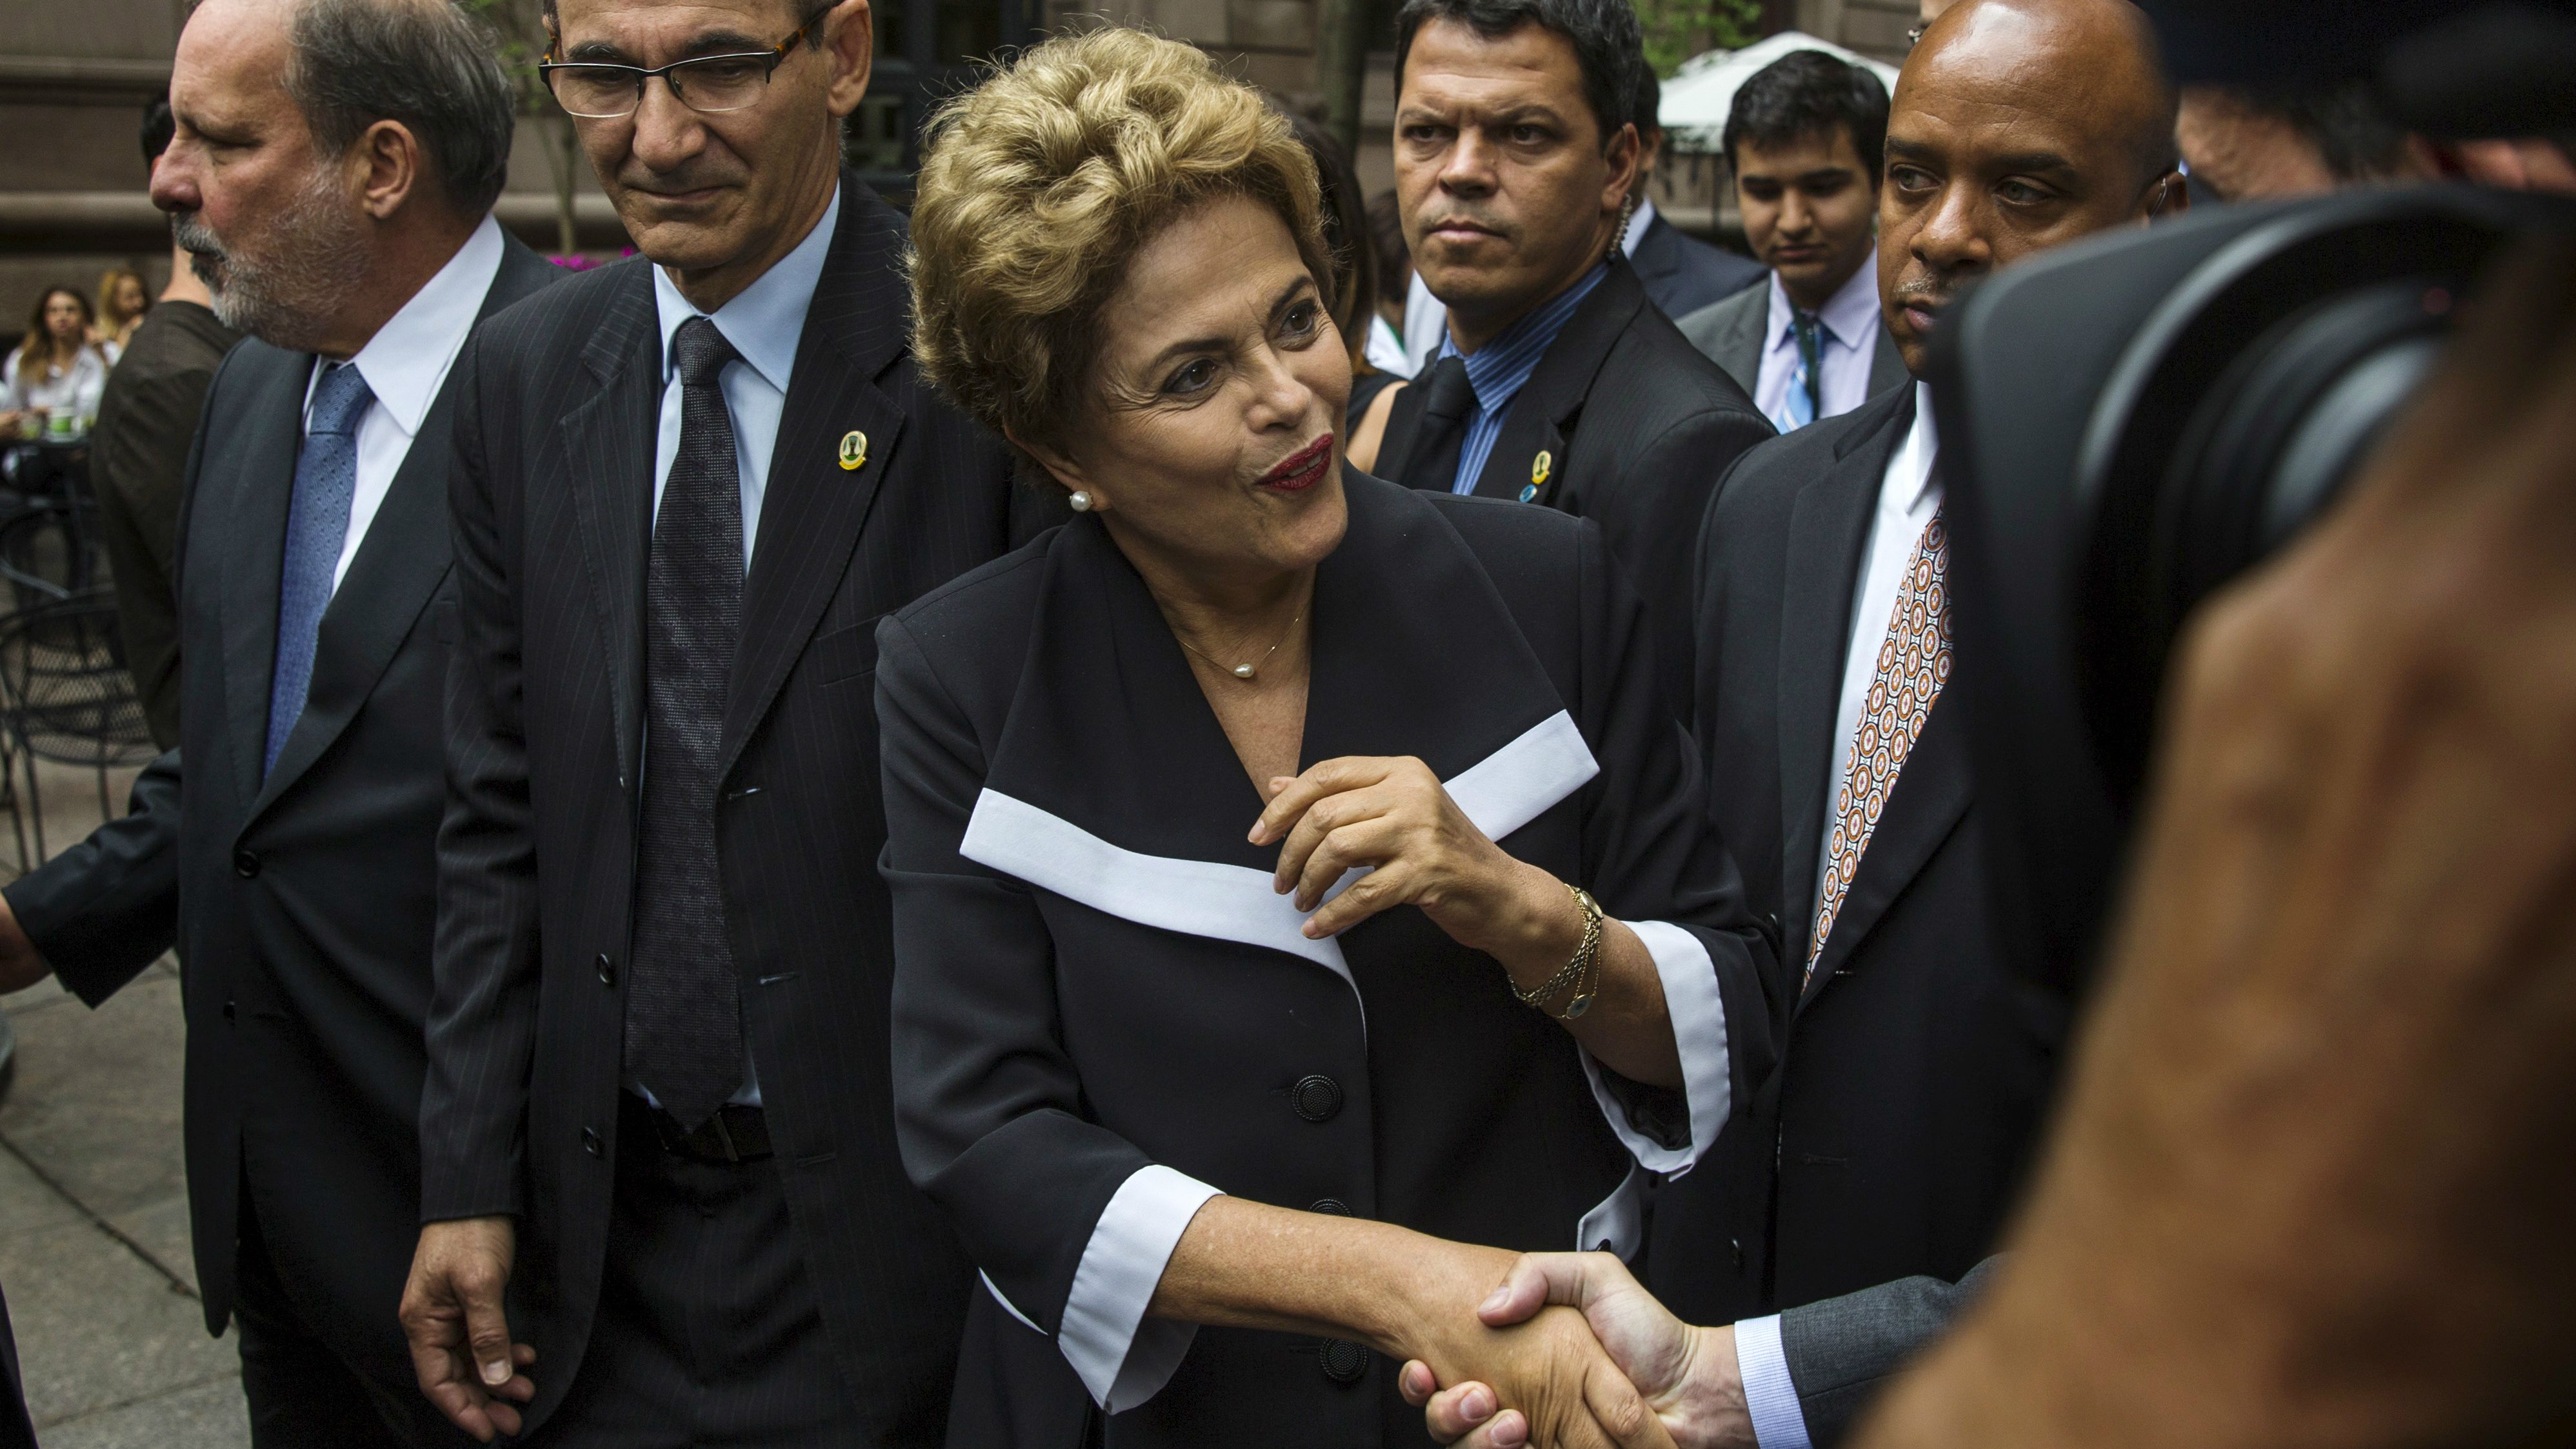 dilma rousseff us visit, brazil